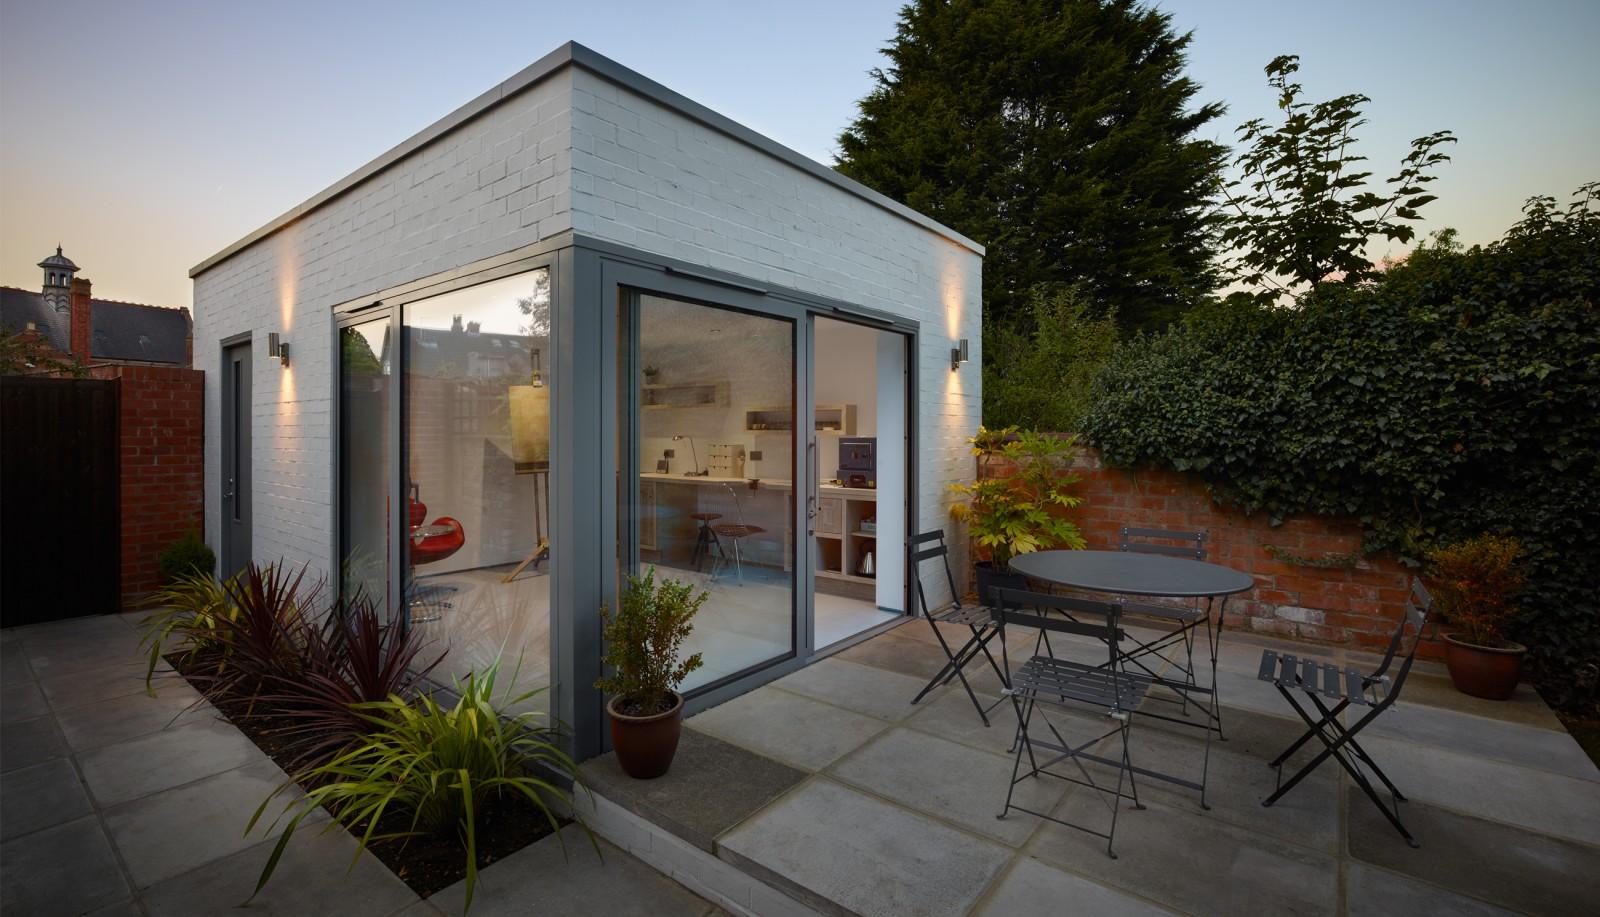 Garden studio id architecture for Best garden studios